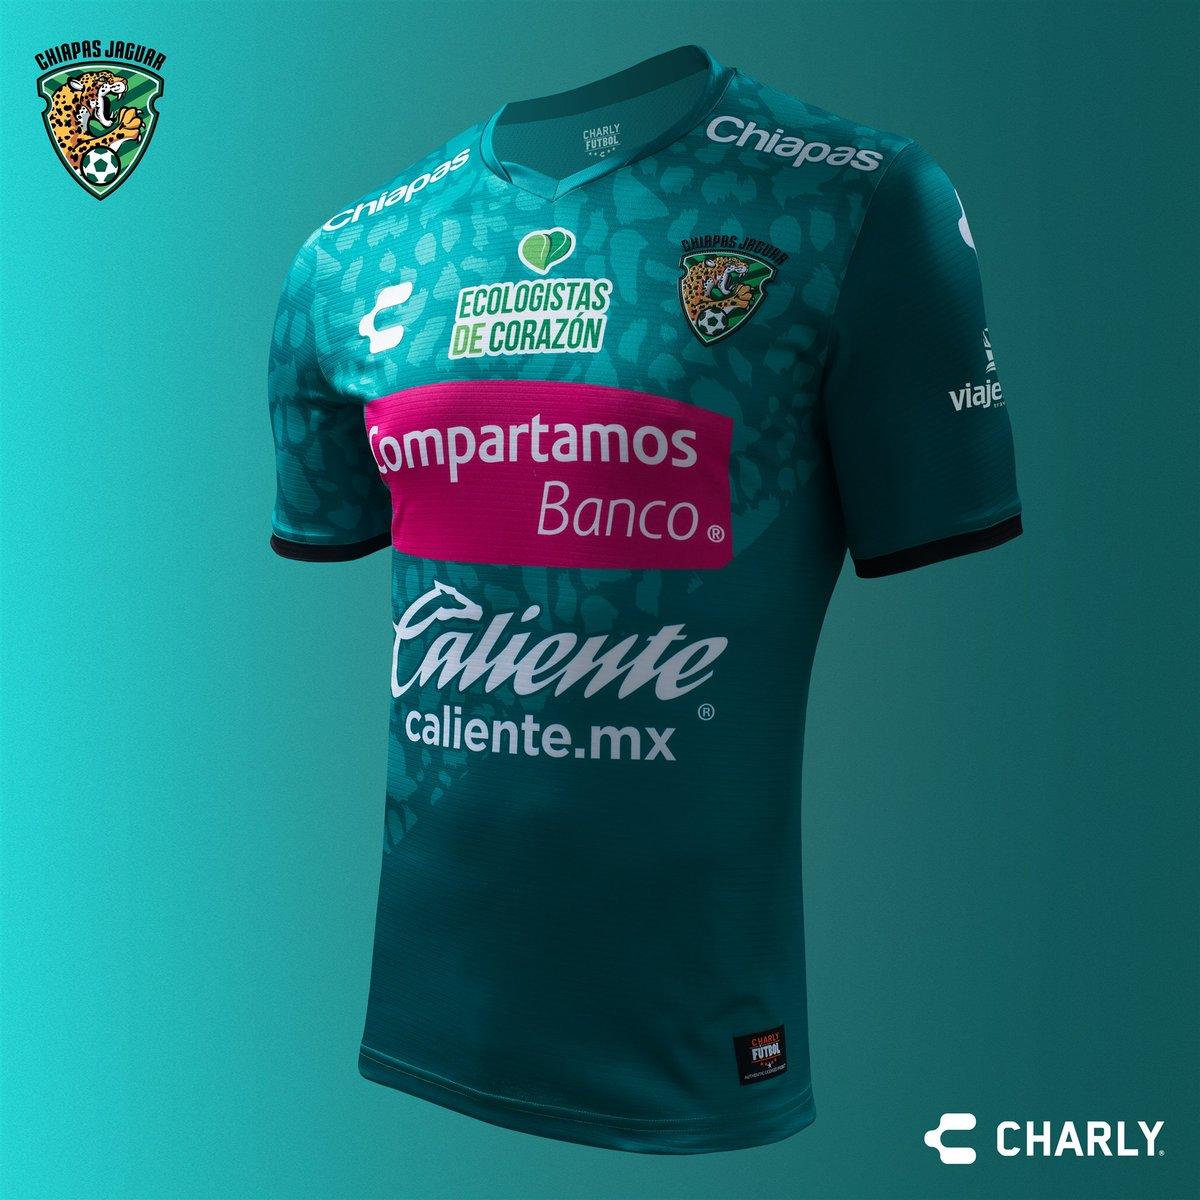 99a42e95a1fbc Charly Fútbol on Twitter